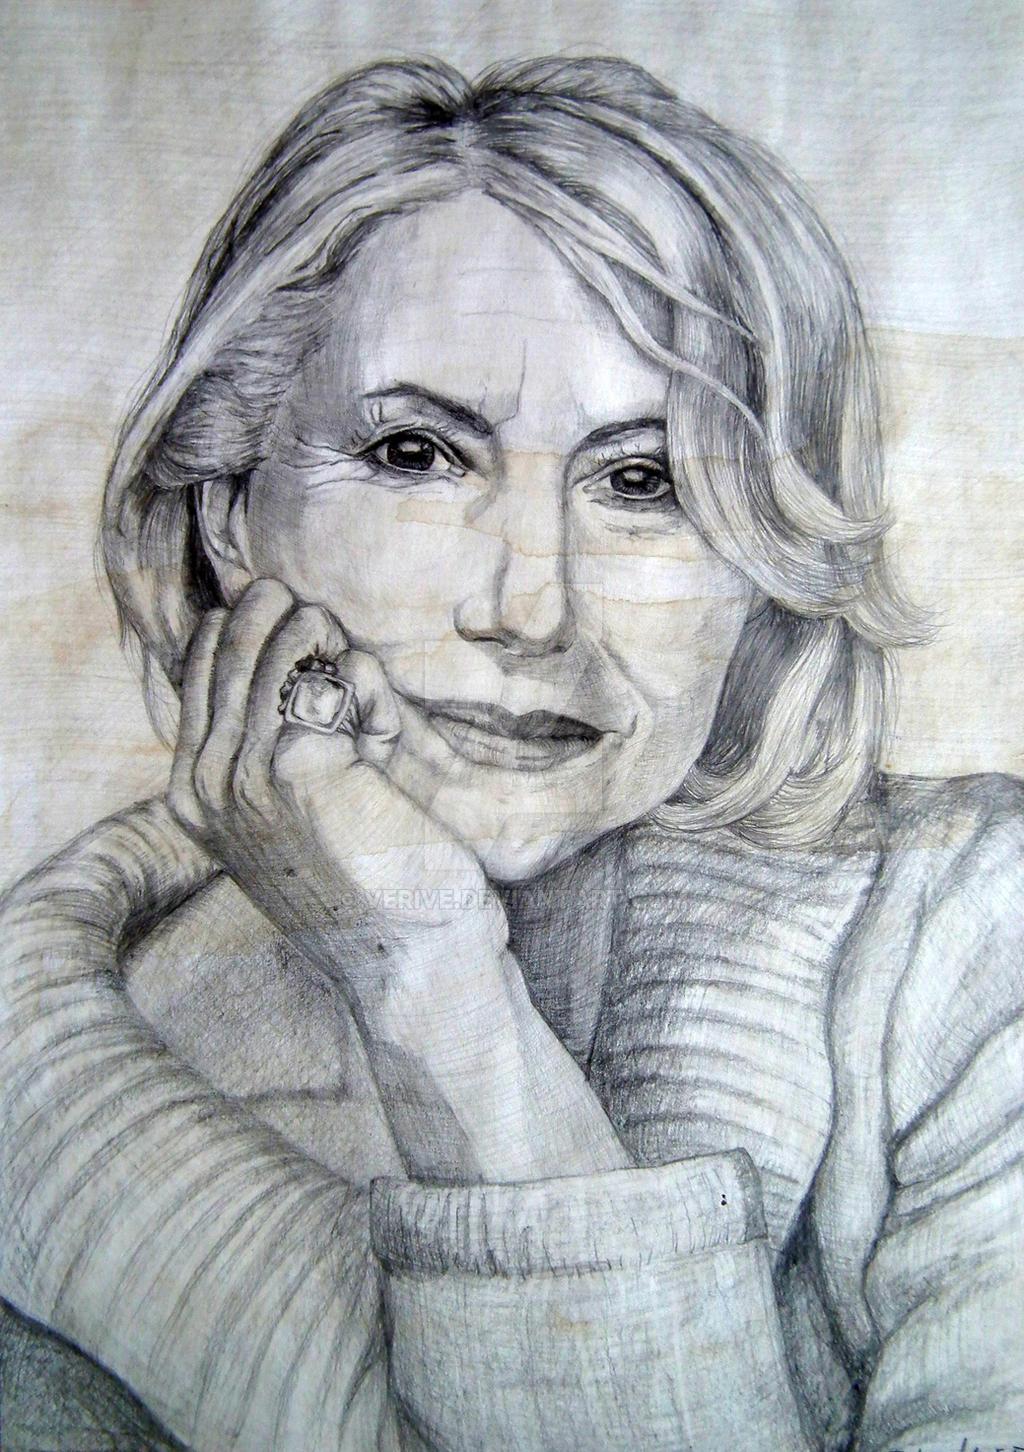 Helen Mirren by verive